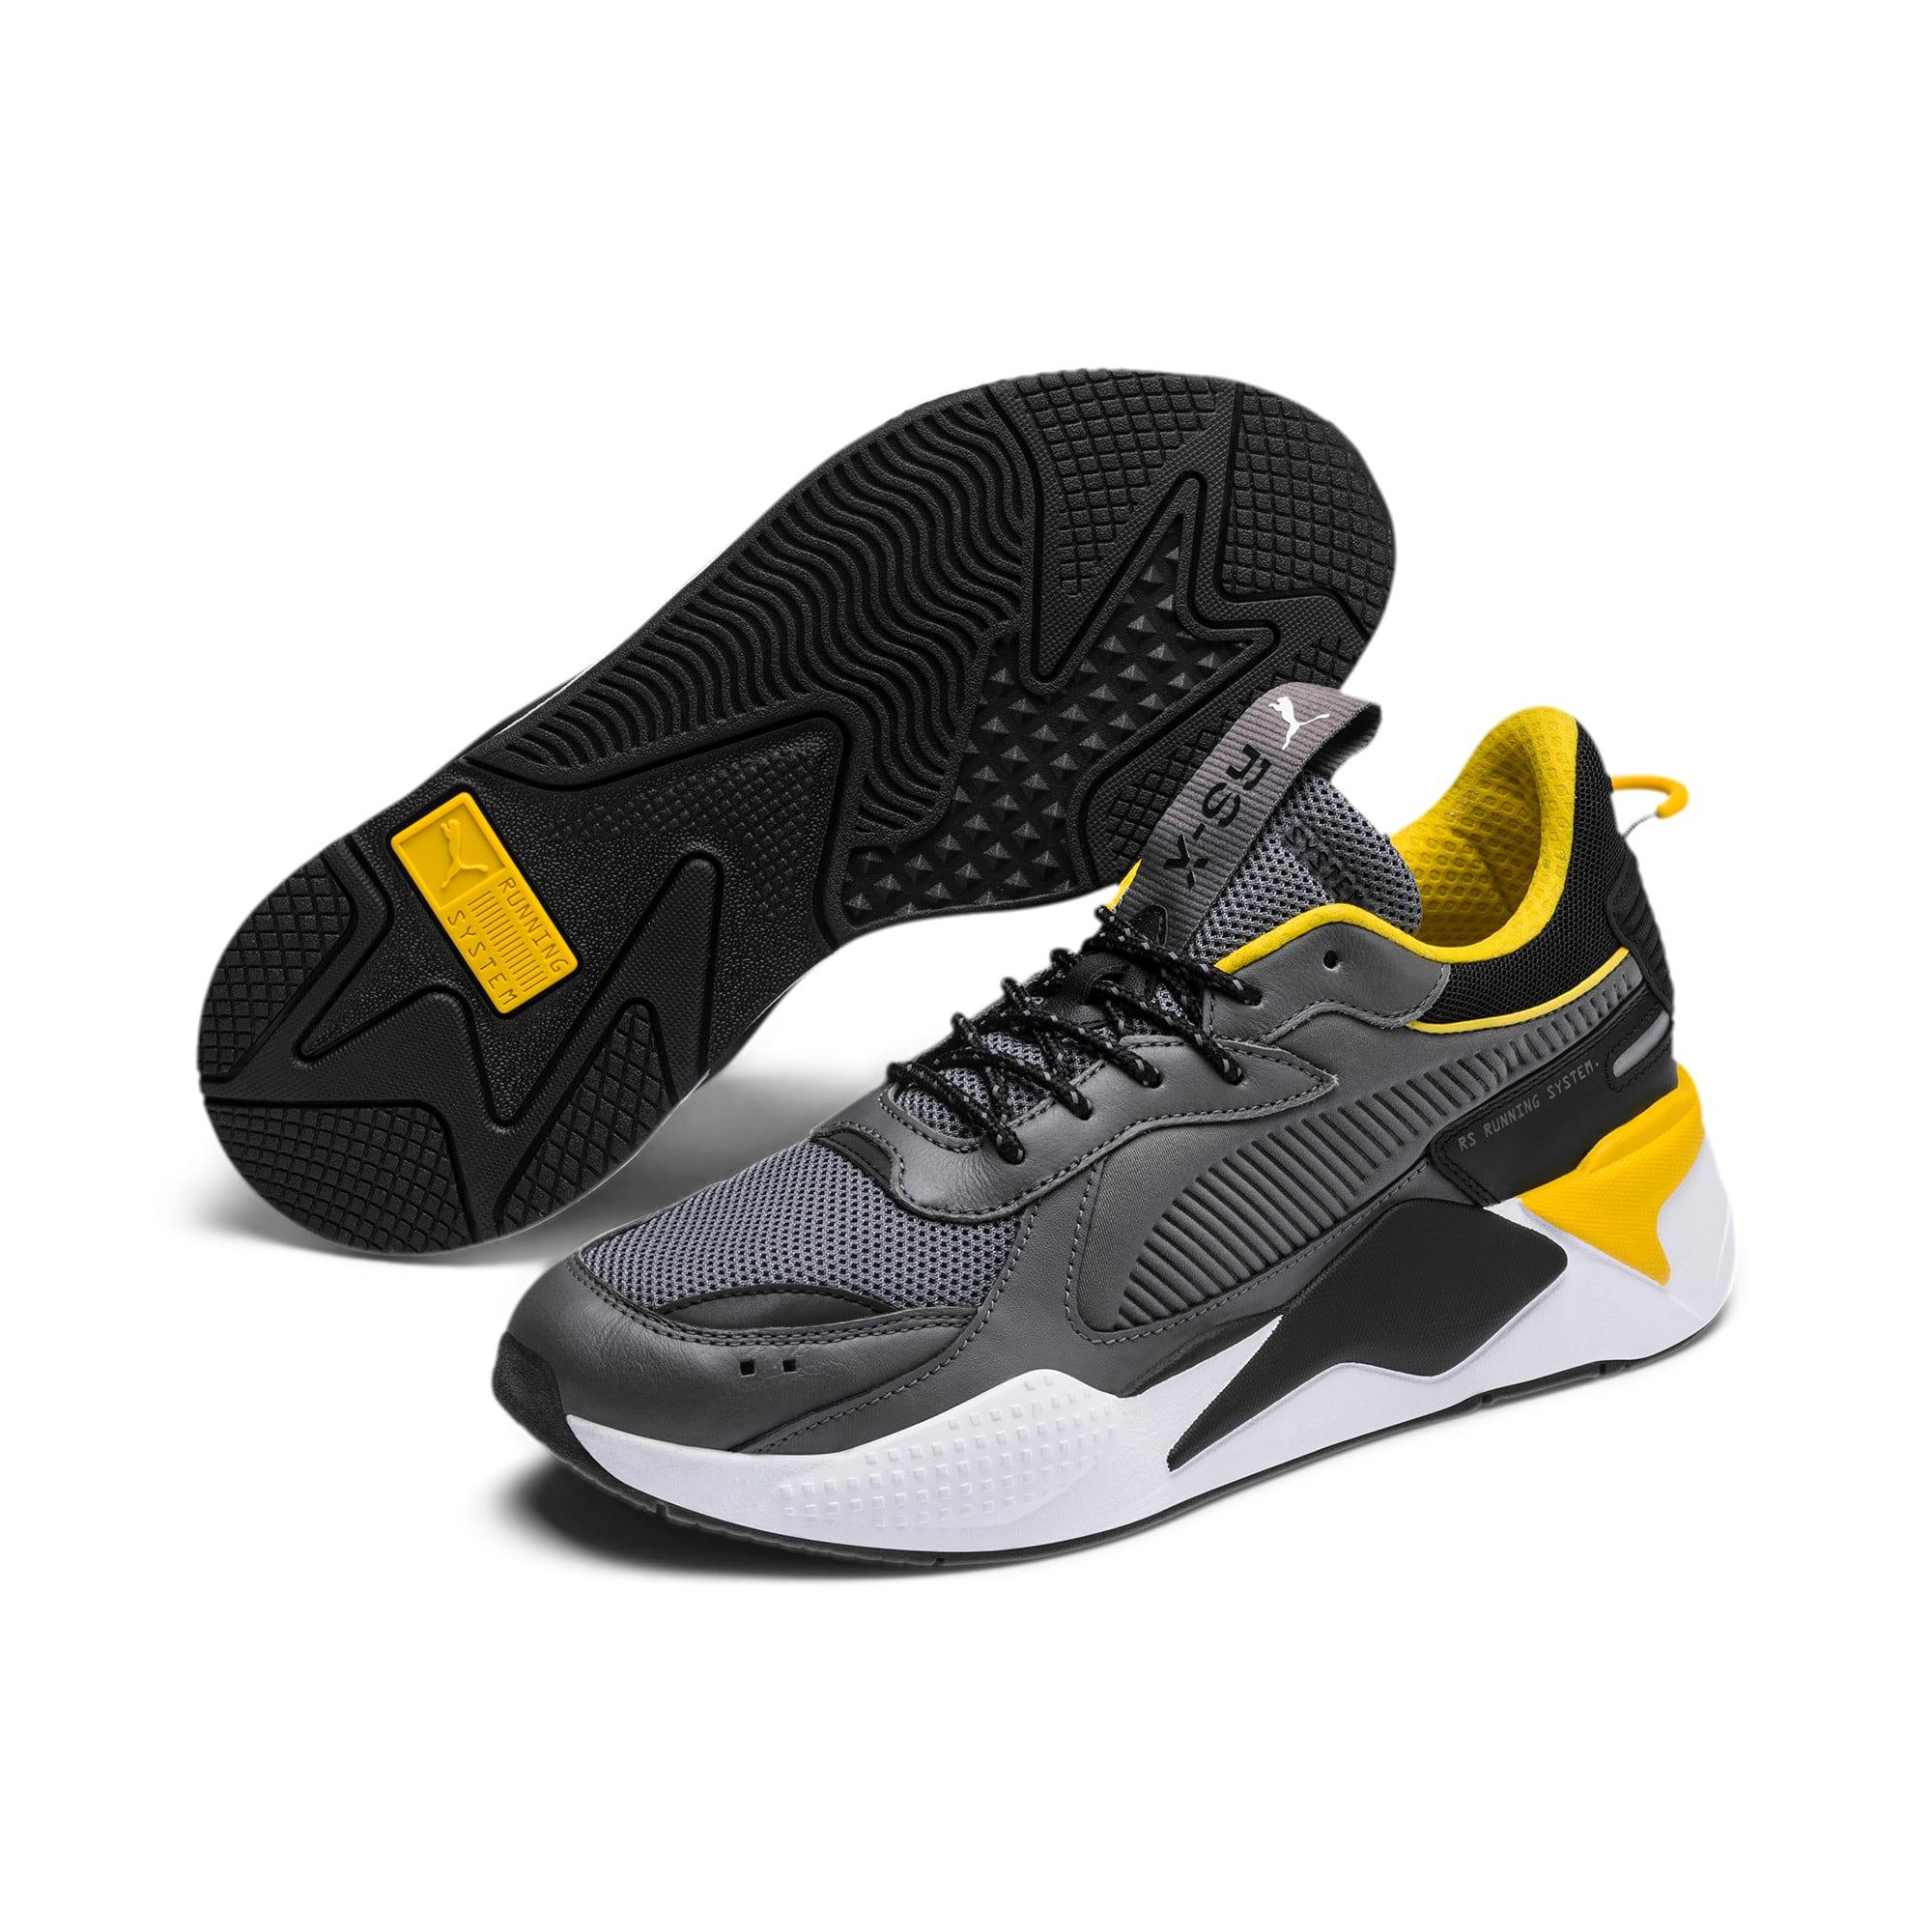 Thumbnail 3 of RS-X Core Sneakers, CASTLEROCK-Puma Black, medium